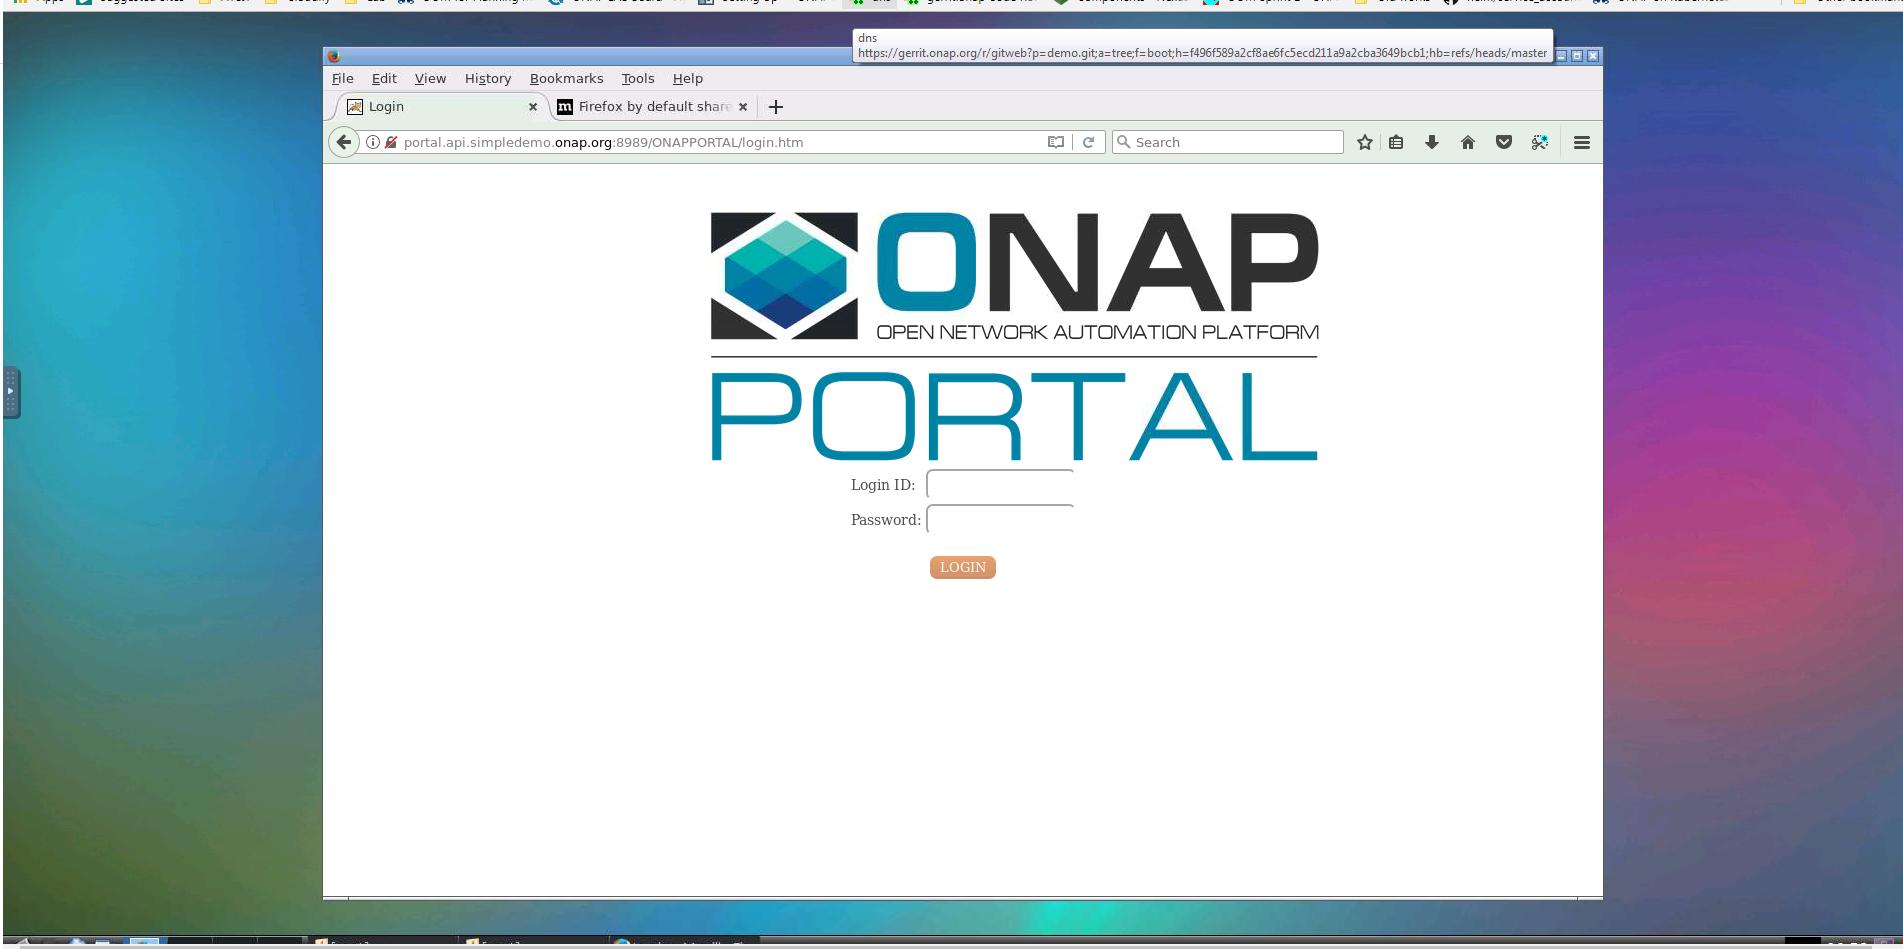 OOM-46] Platform infrastructure deployment with TOSCA - ONAP